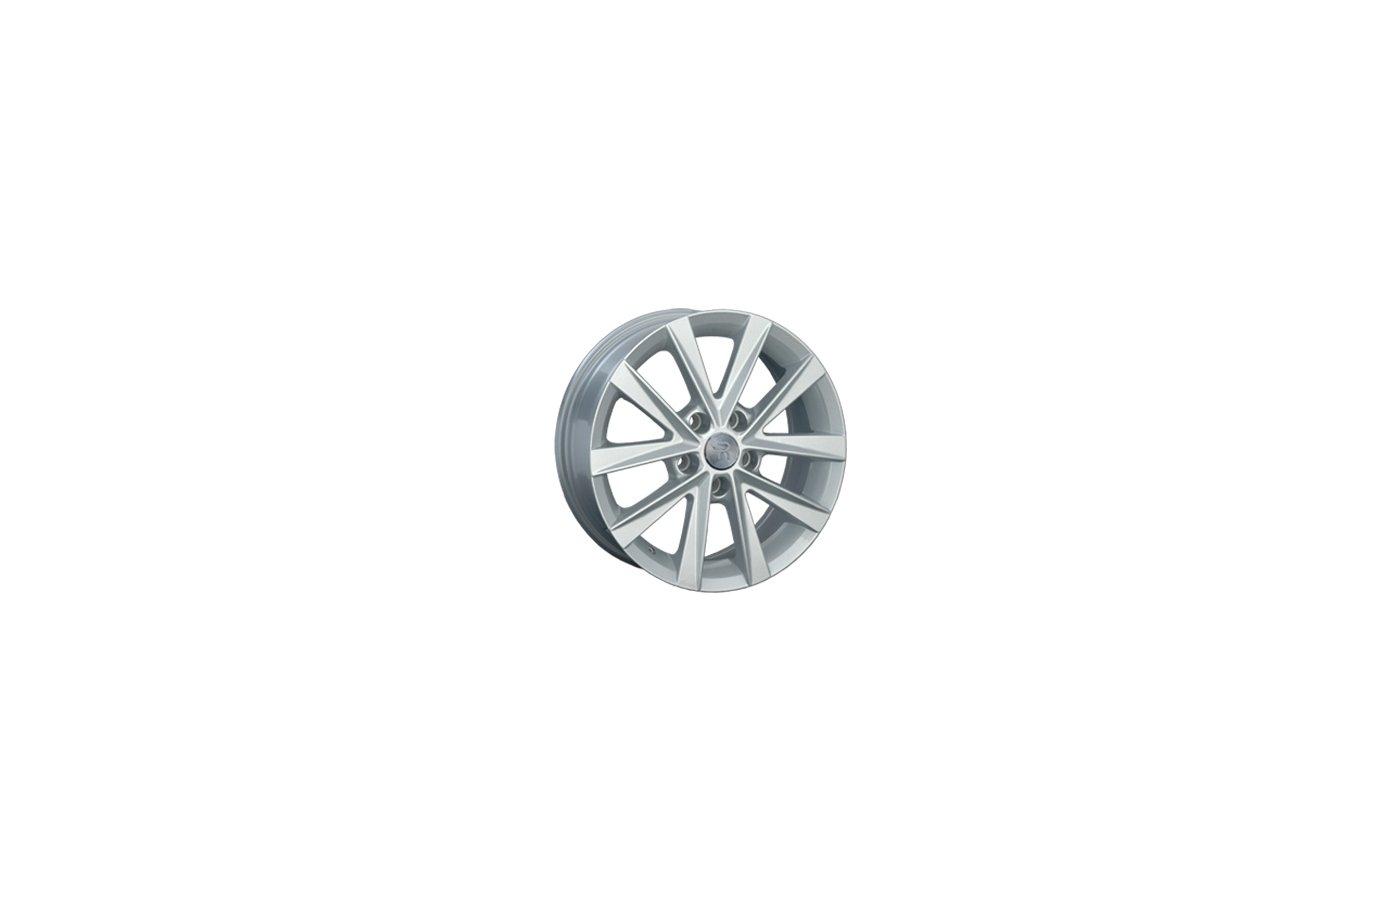 Диск Replay-LA VW116 6.5x16/5x112 D57.1 ET42 S